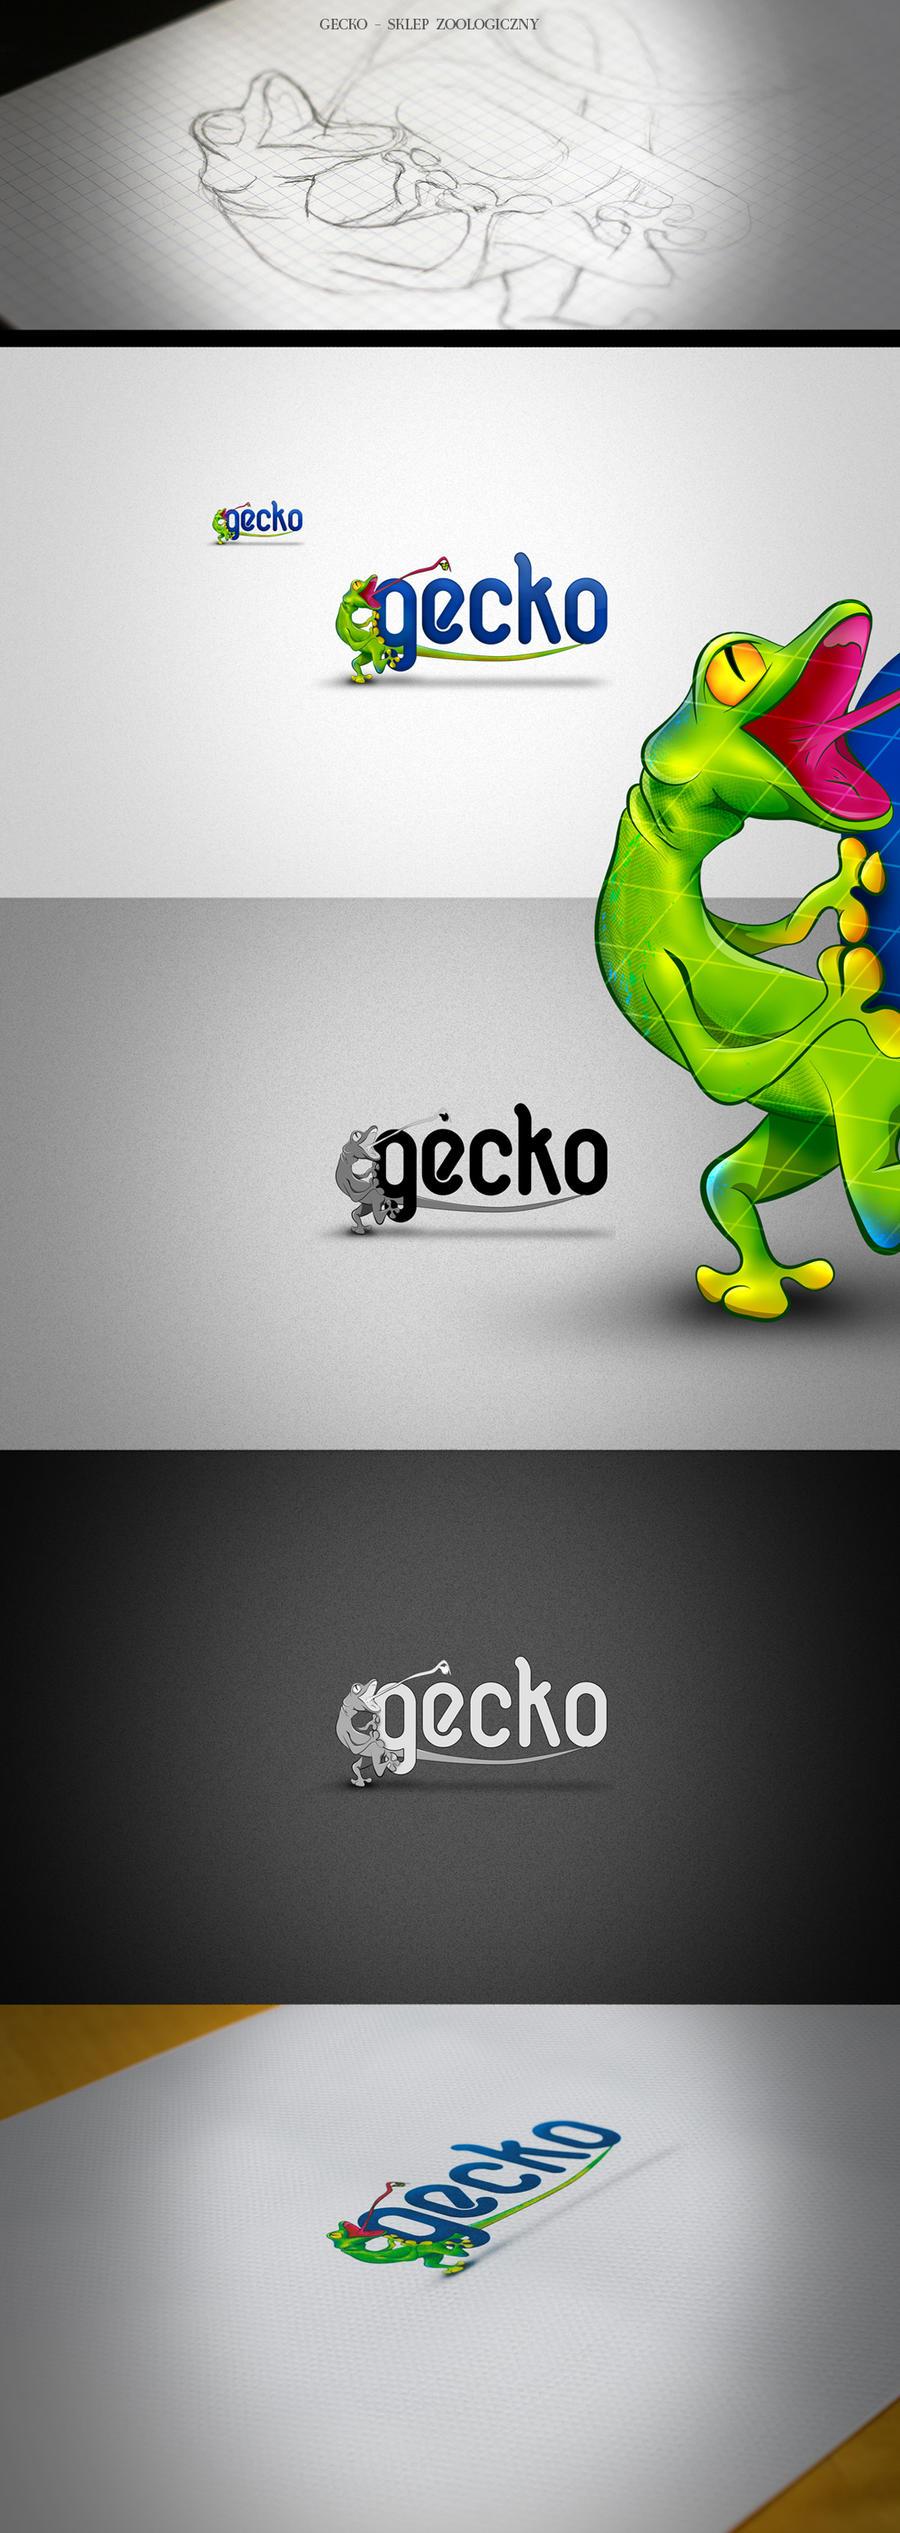 gecko by mprudlak